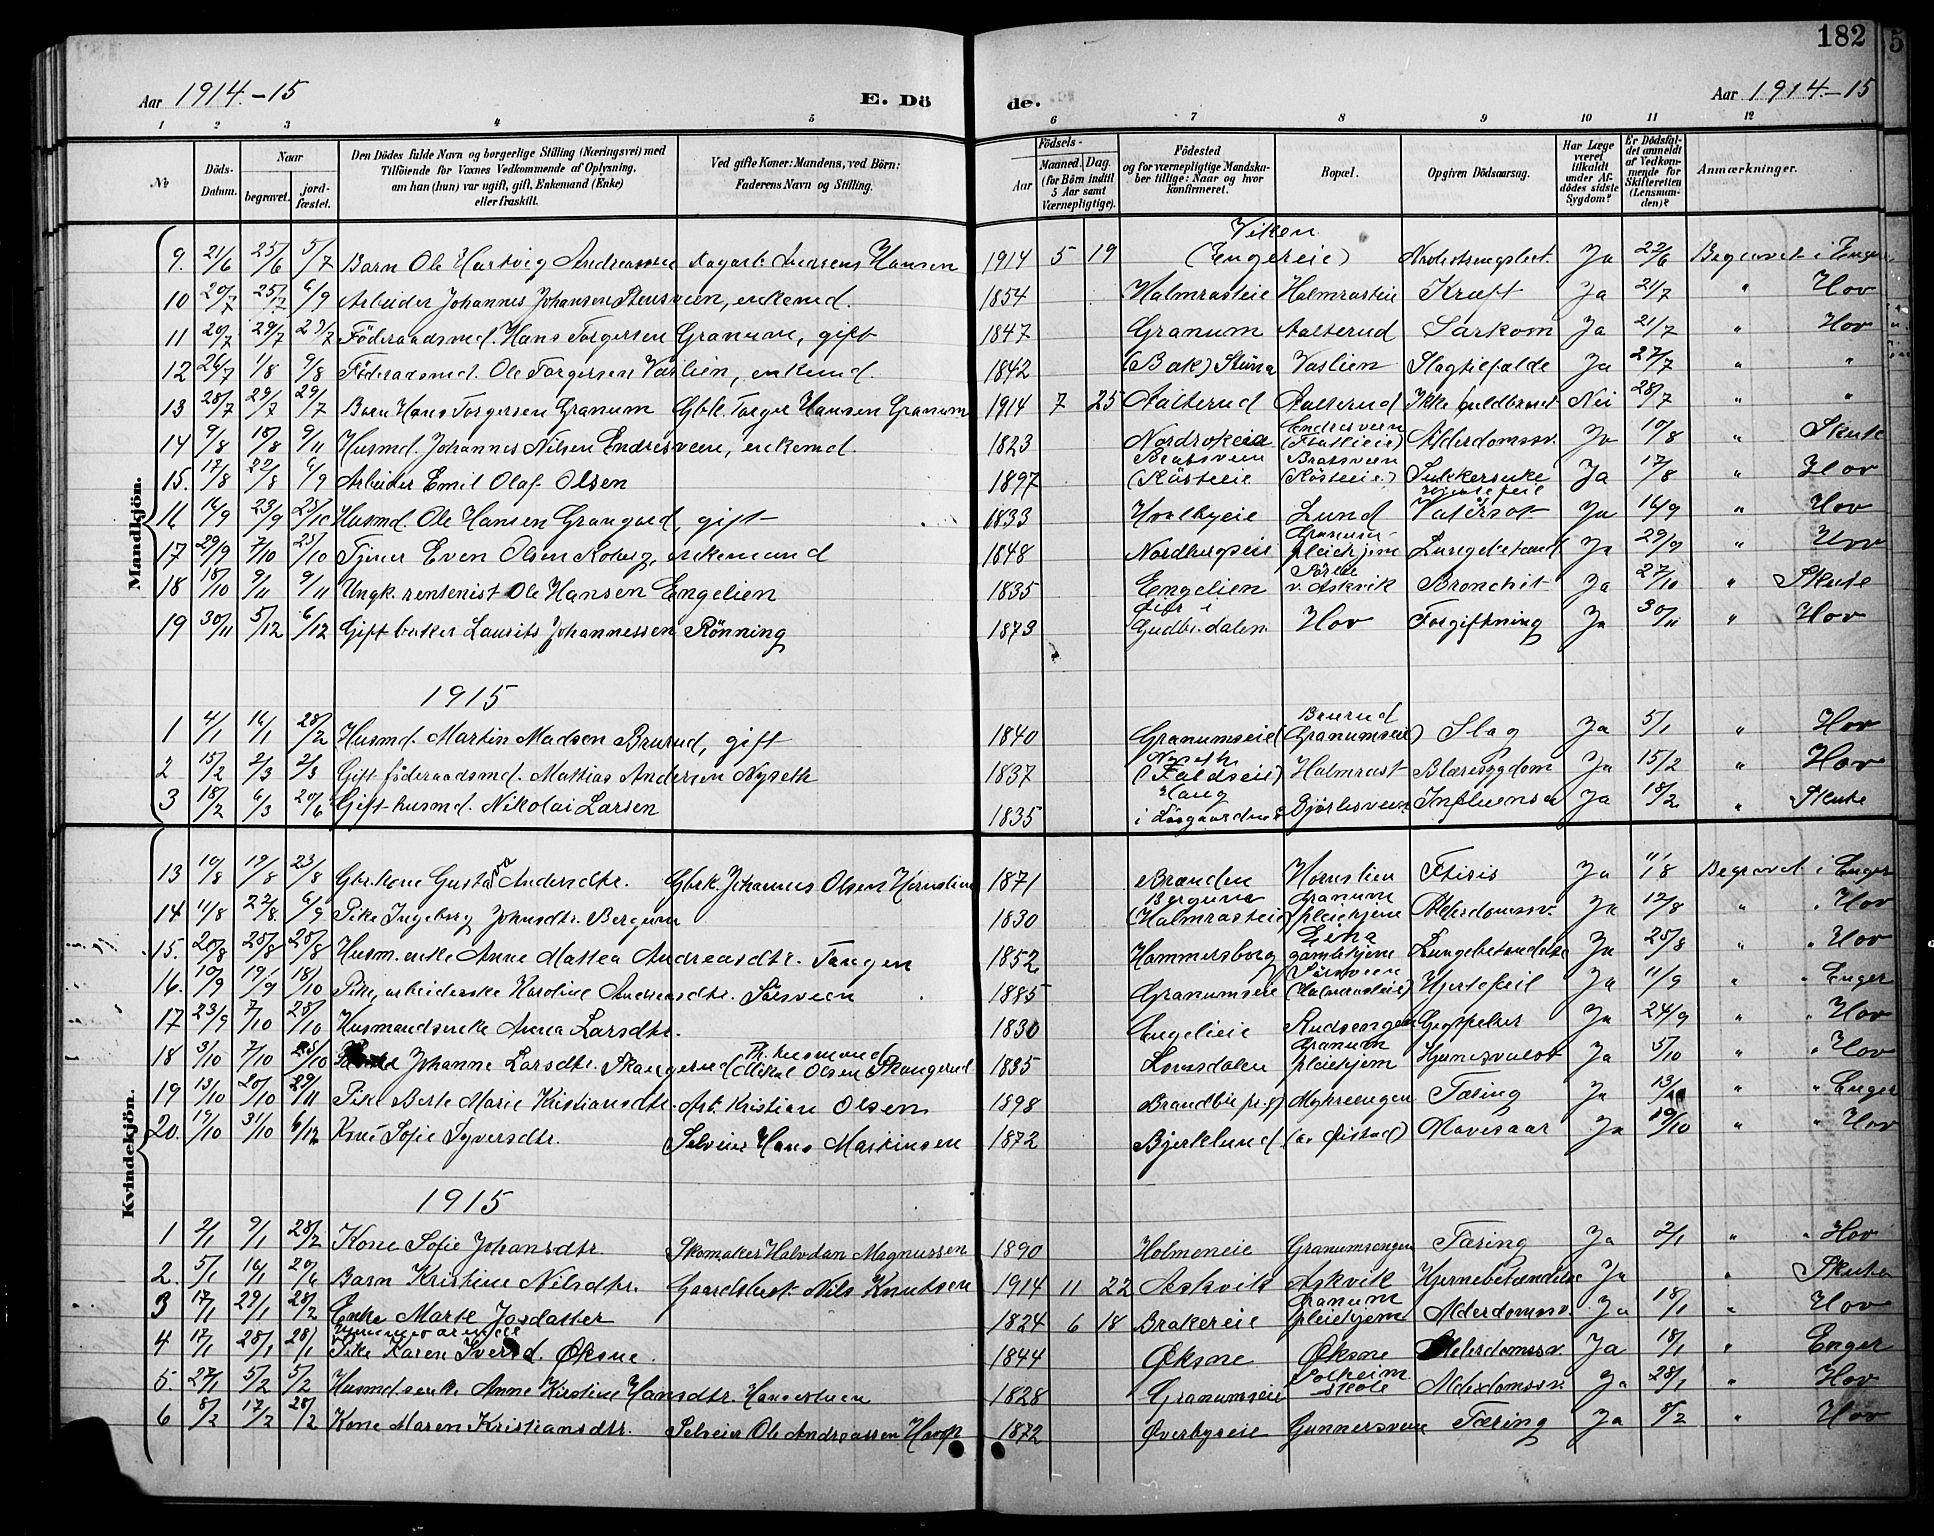 SAH, Søndre Land prestekontor, L/L0004: Klokkerbok nr. 4, 1901-1915, s. 182